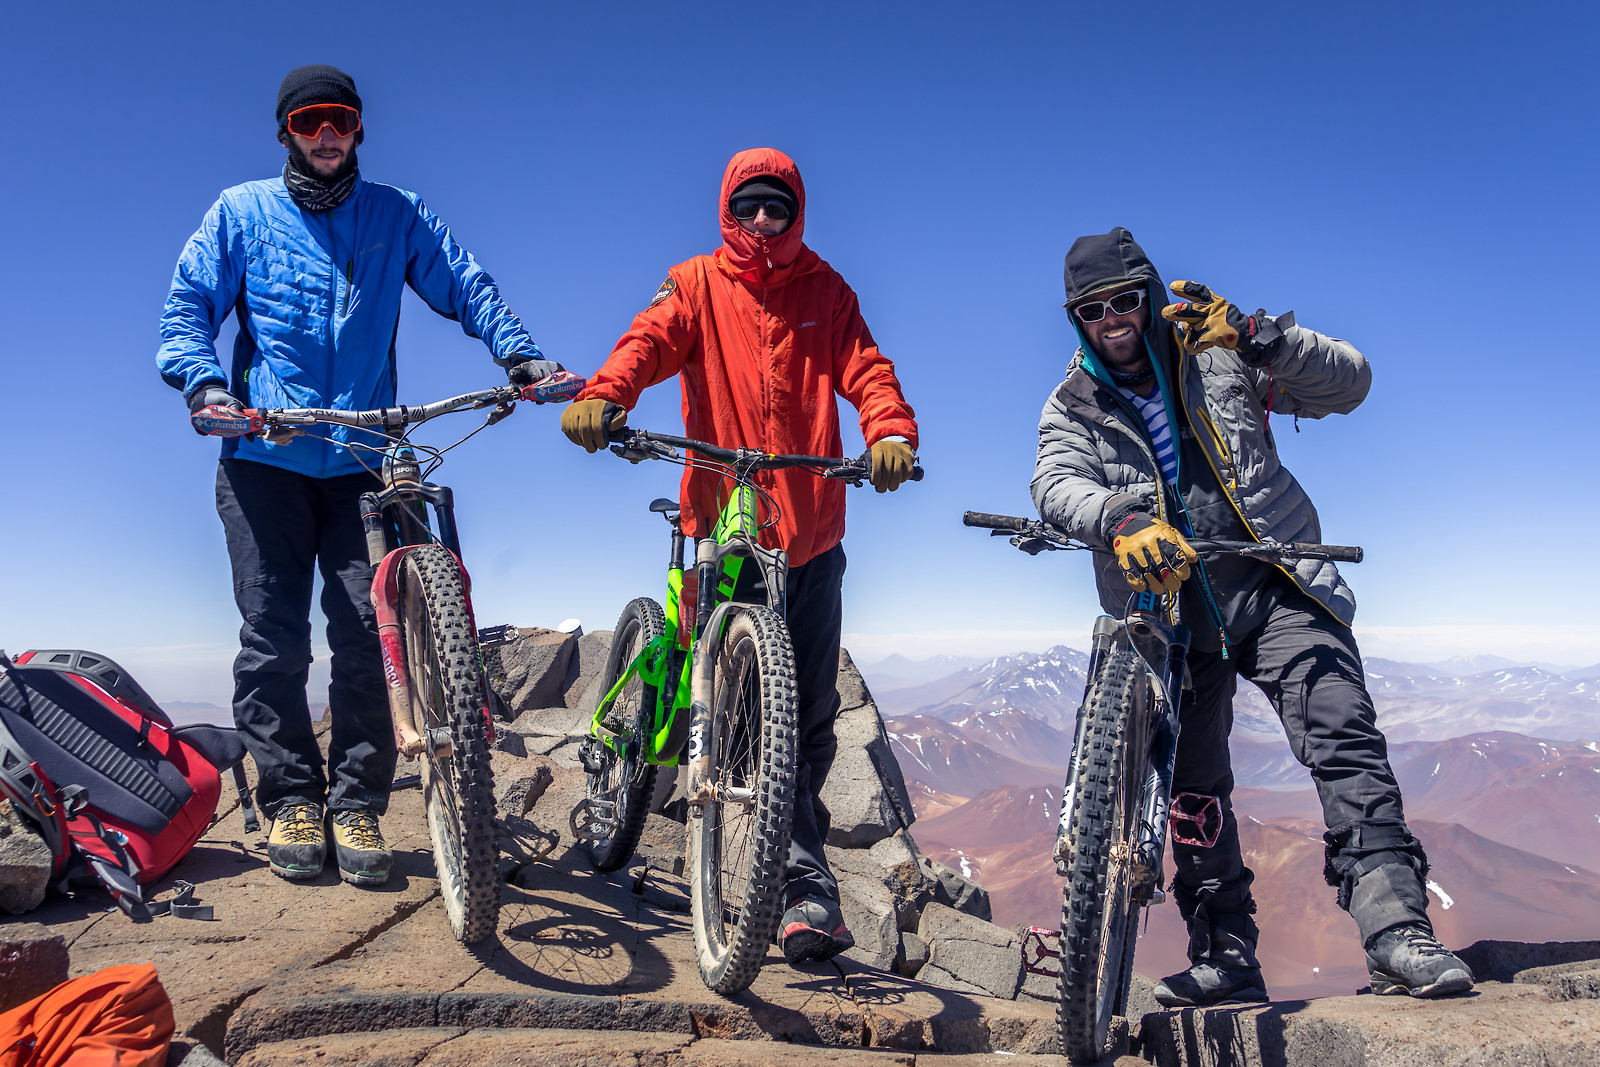 llullaillaco2-30 - bigmountainbike - Mountain Biking Pictures - Vital MTB